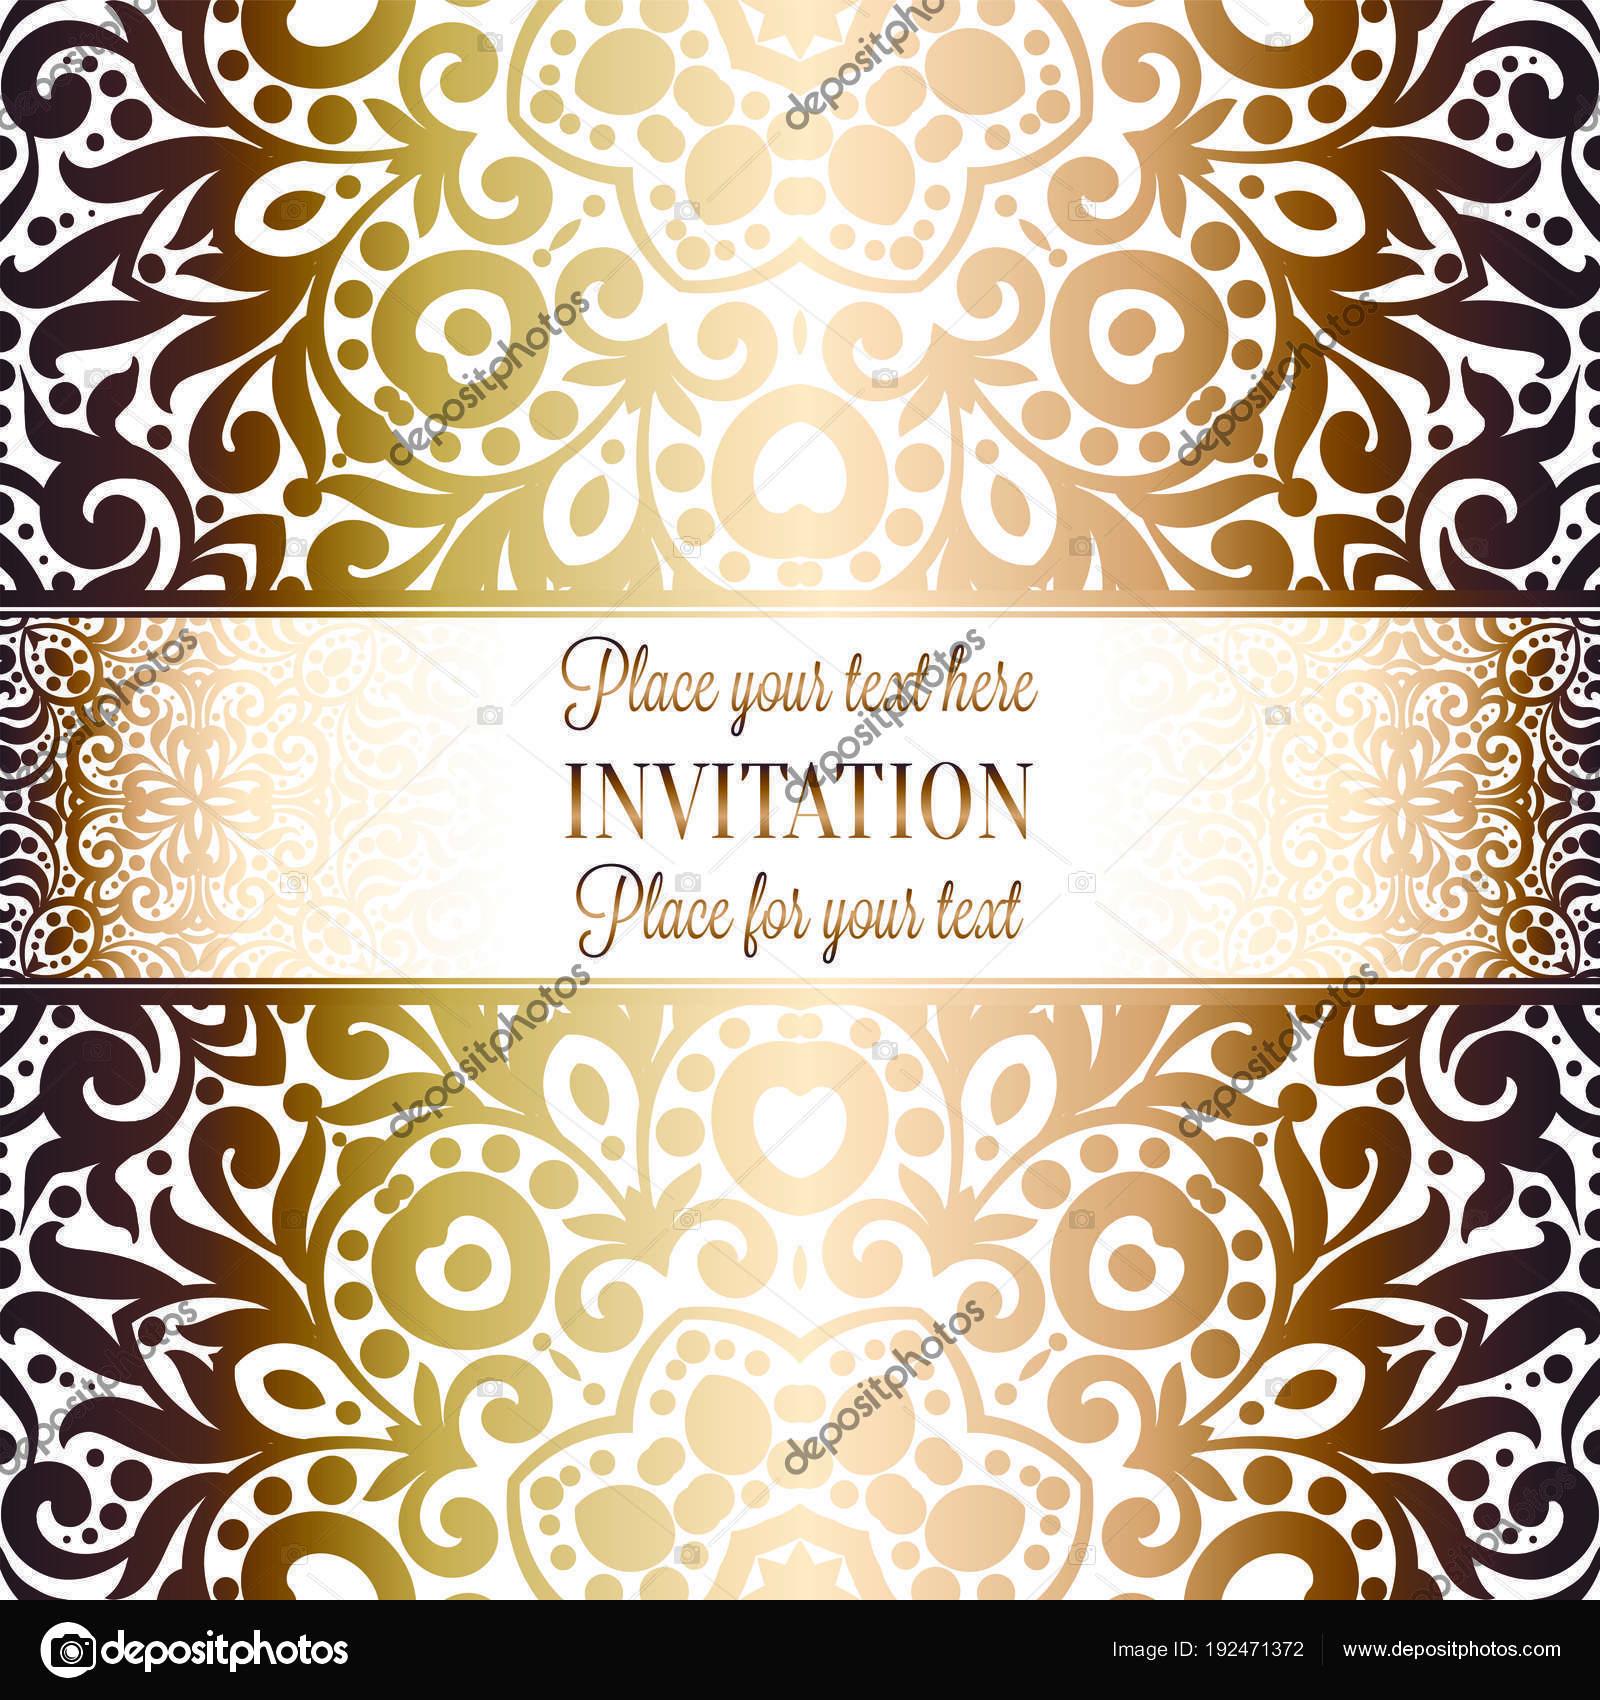 Gold Wedding Invitation Card Template Design Damask Pattern